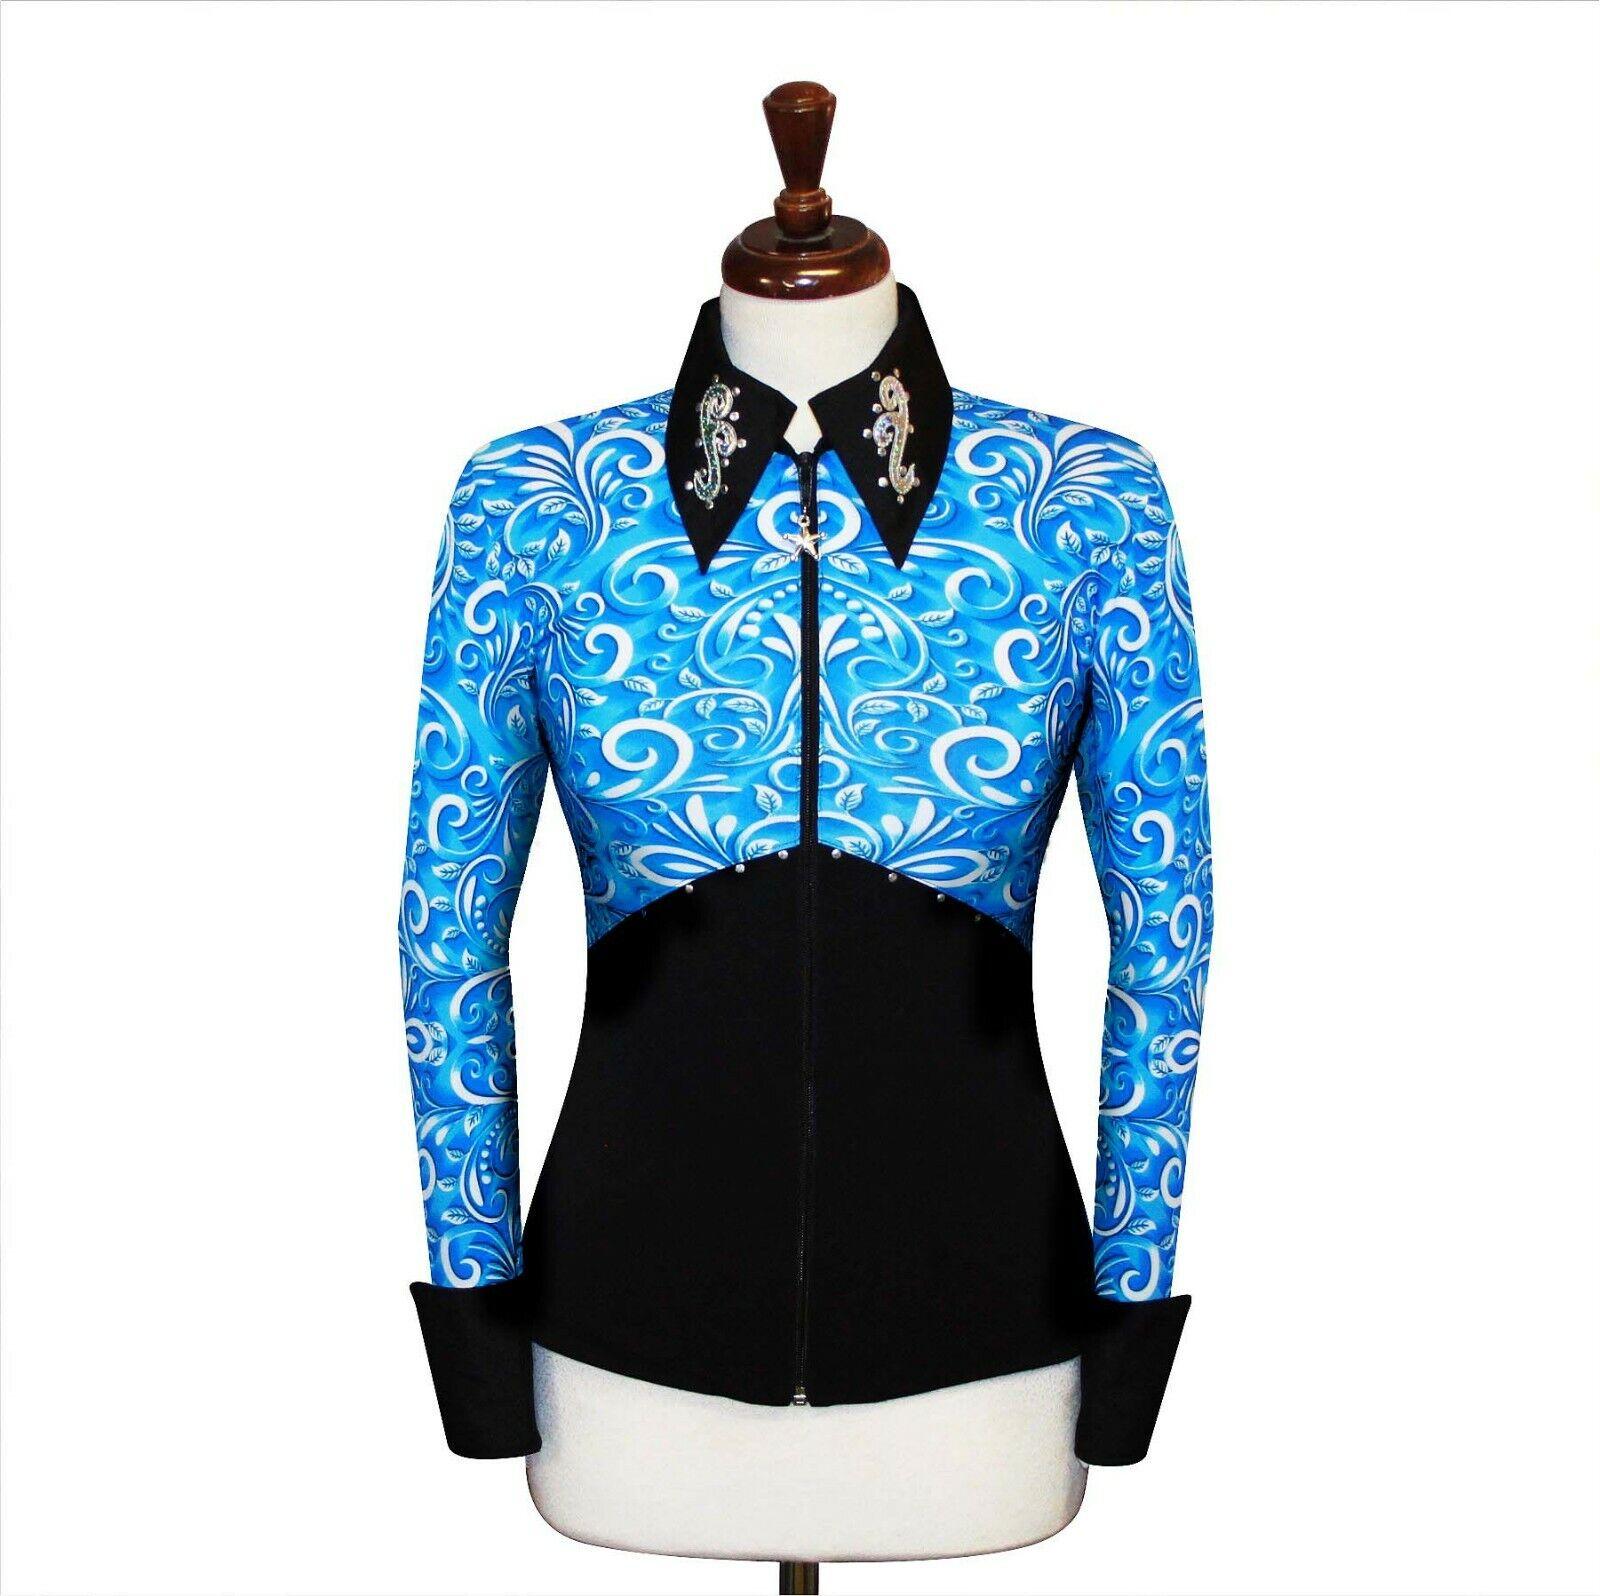 2Xgree mostrareuomoship Pleasure cavallouomoship mostrare Jacket Shirt astaeo regina Rail